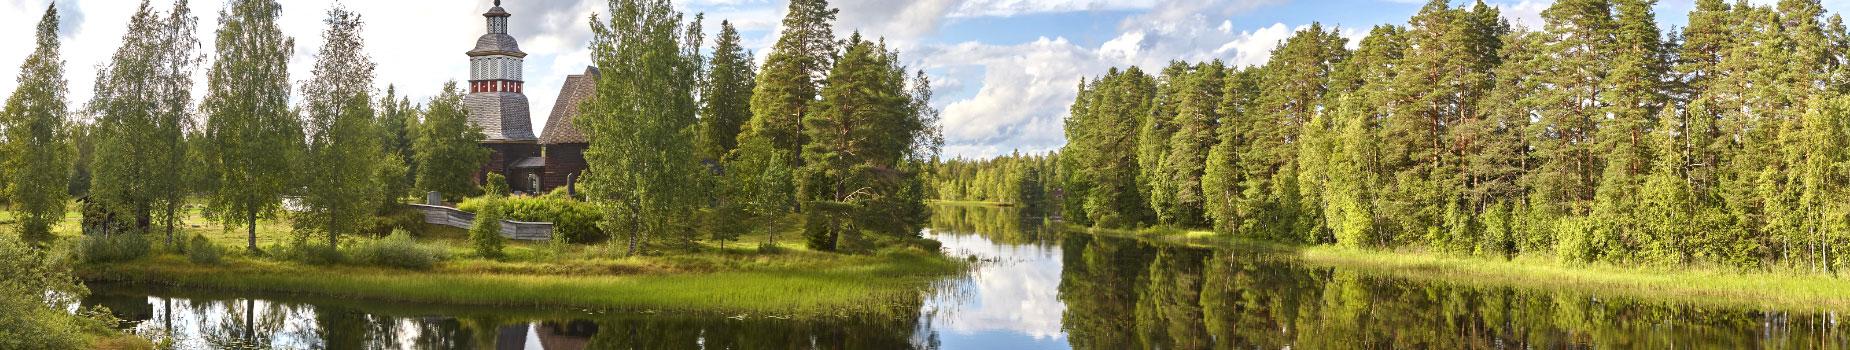 Vlieg busreis Finland